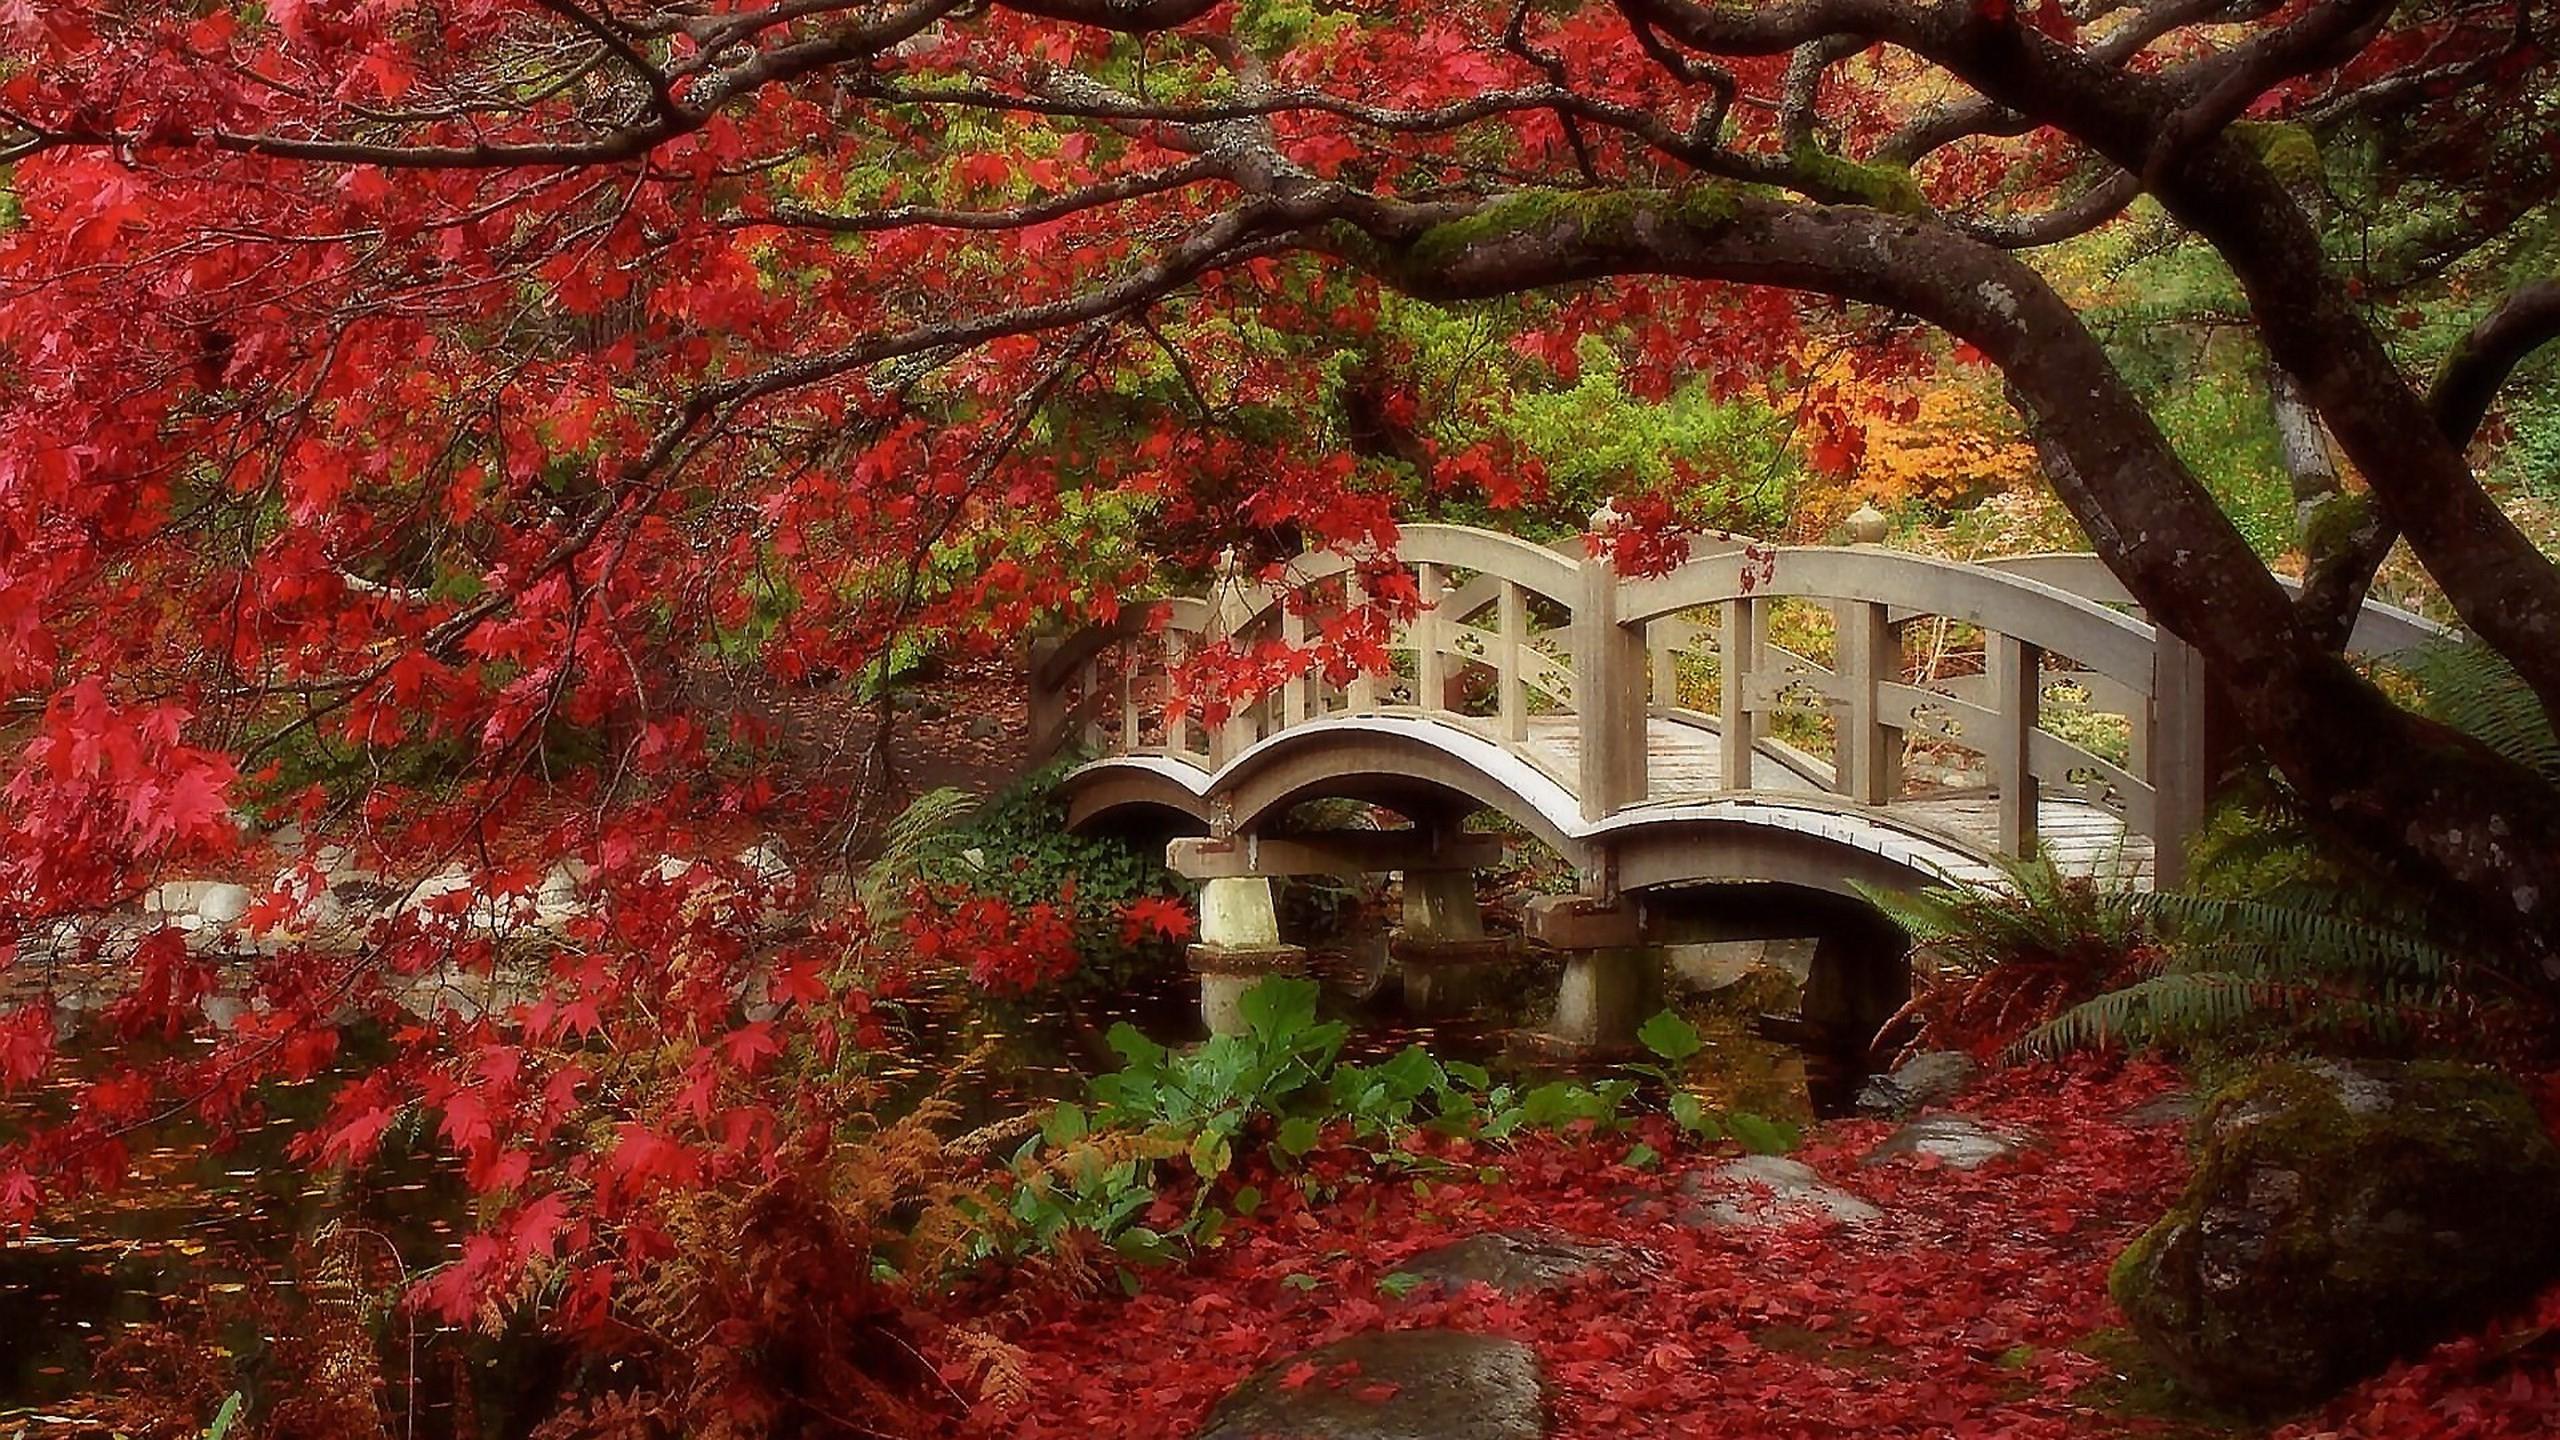 Res: 2560x1440, wallpaper desktop japanese garden